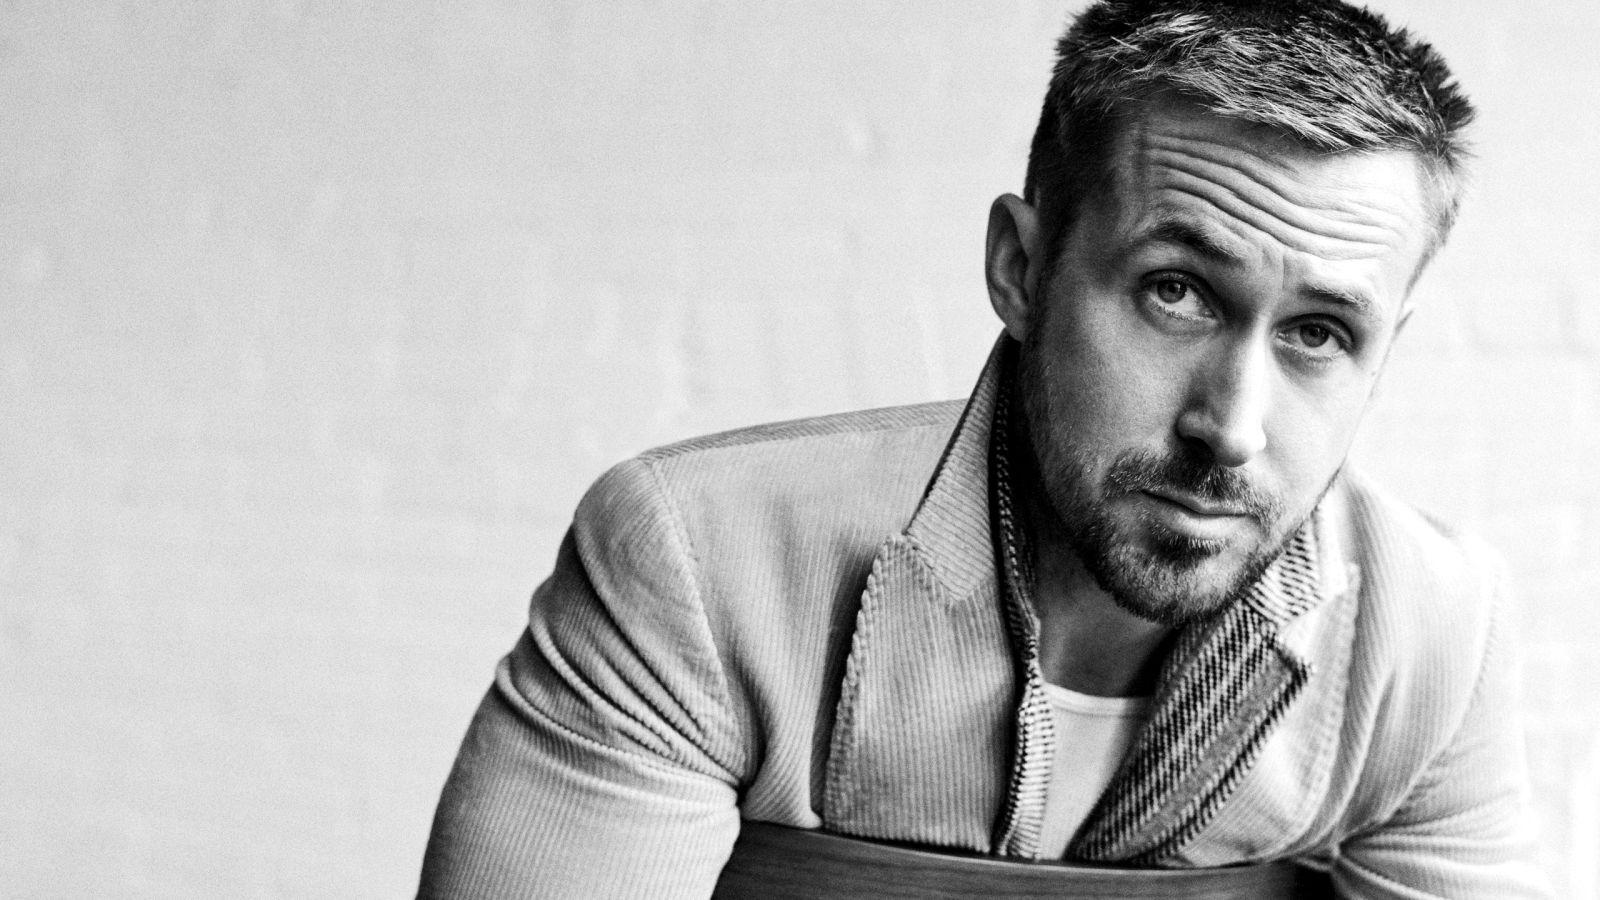 Ryan Gosling 00